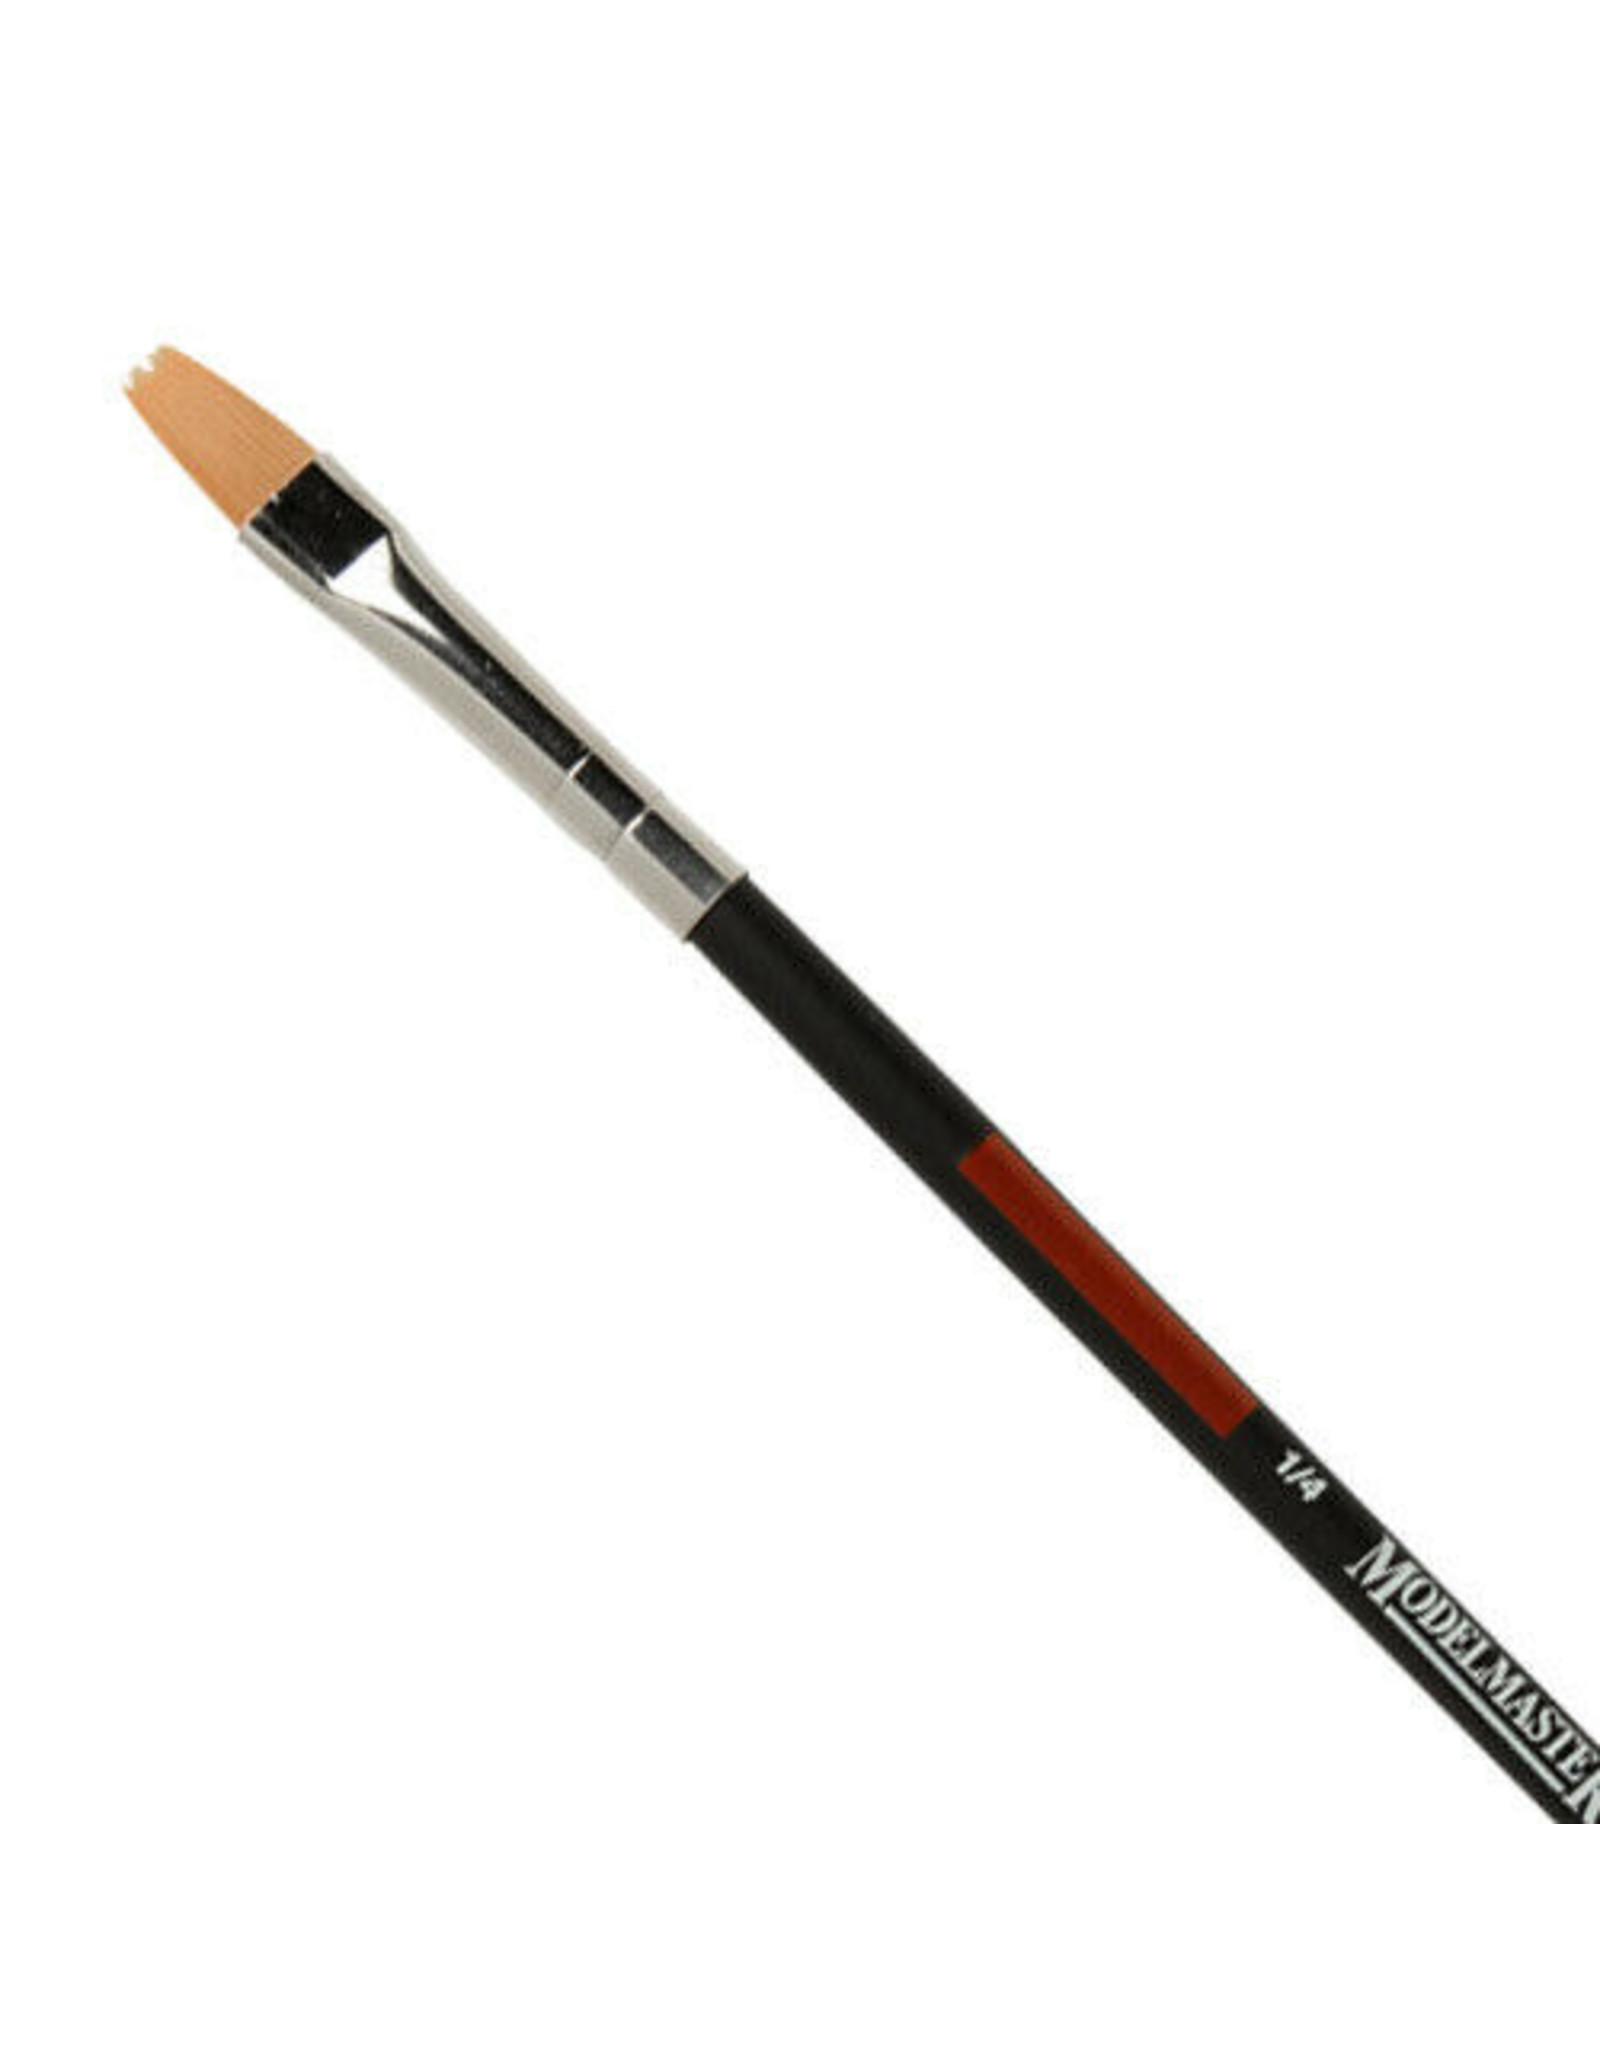 "Testors 8833C - 1/4"" Golden Synthetic Chisel Brush"